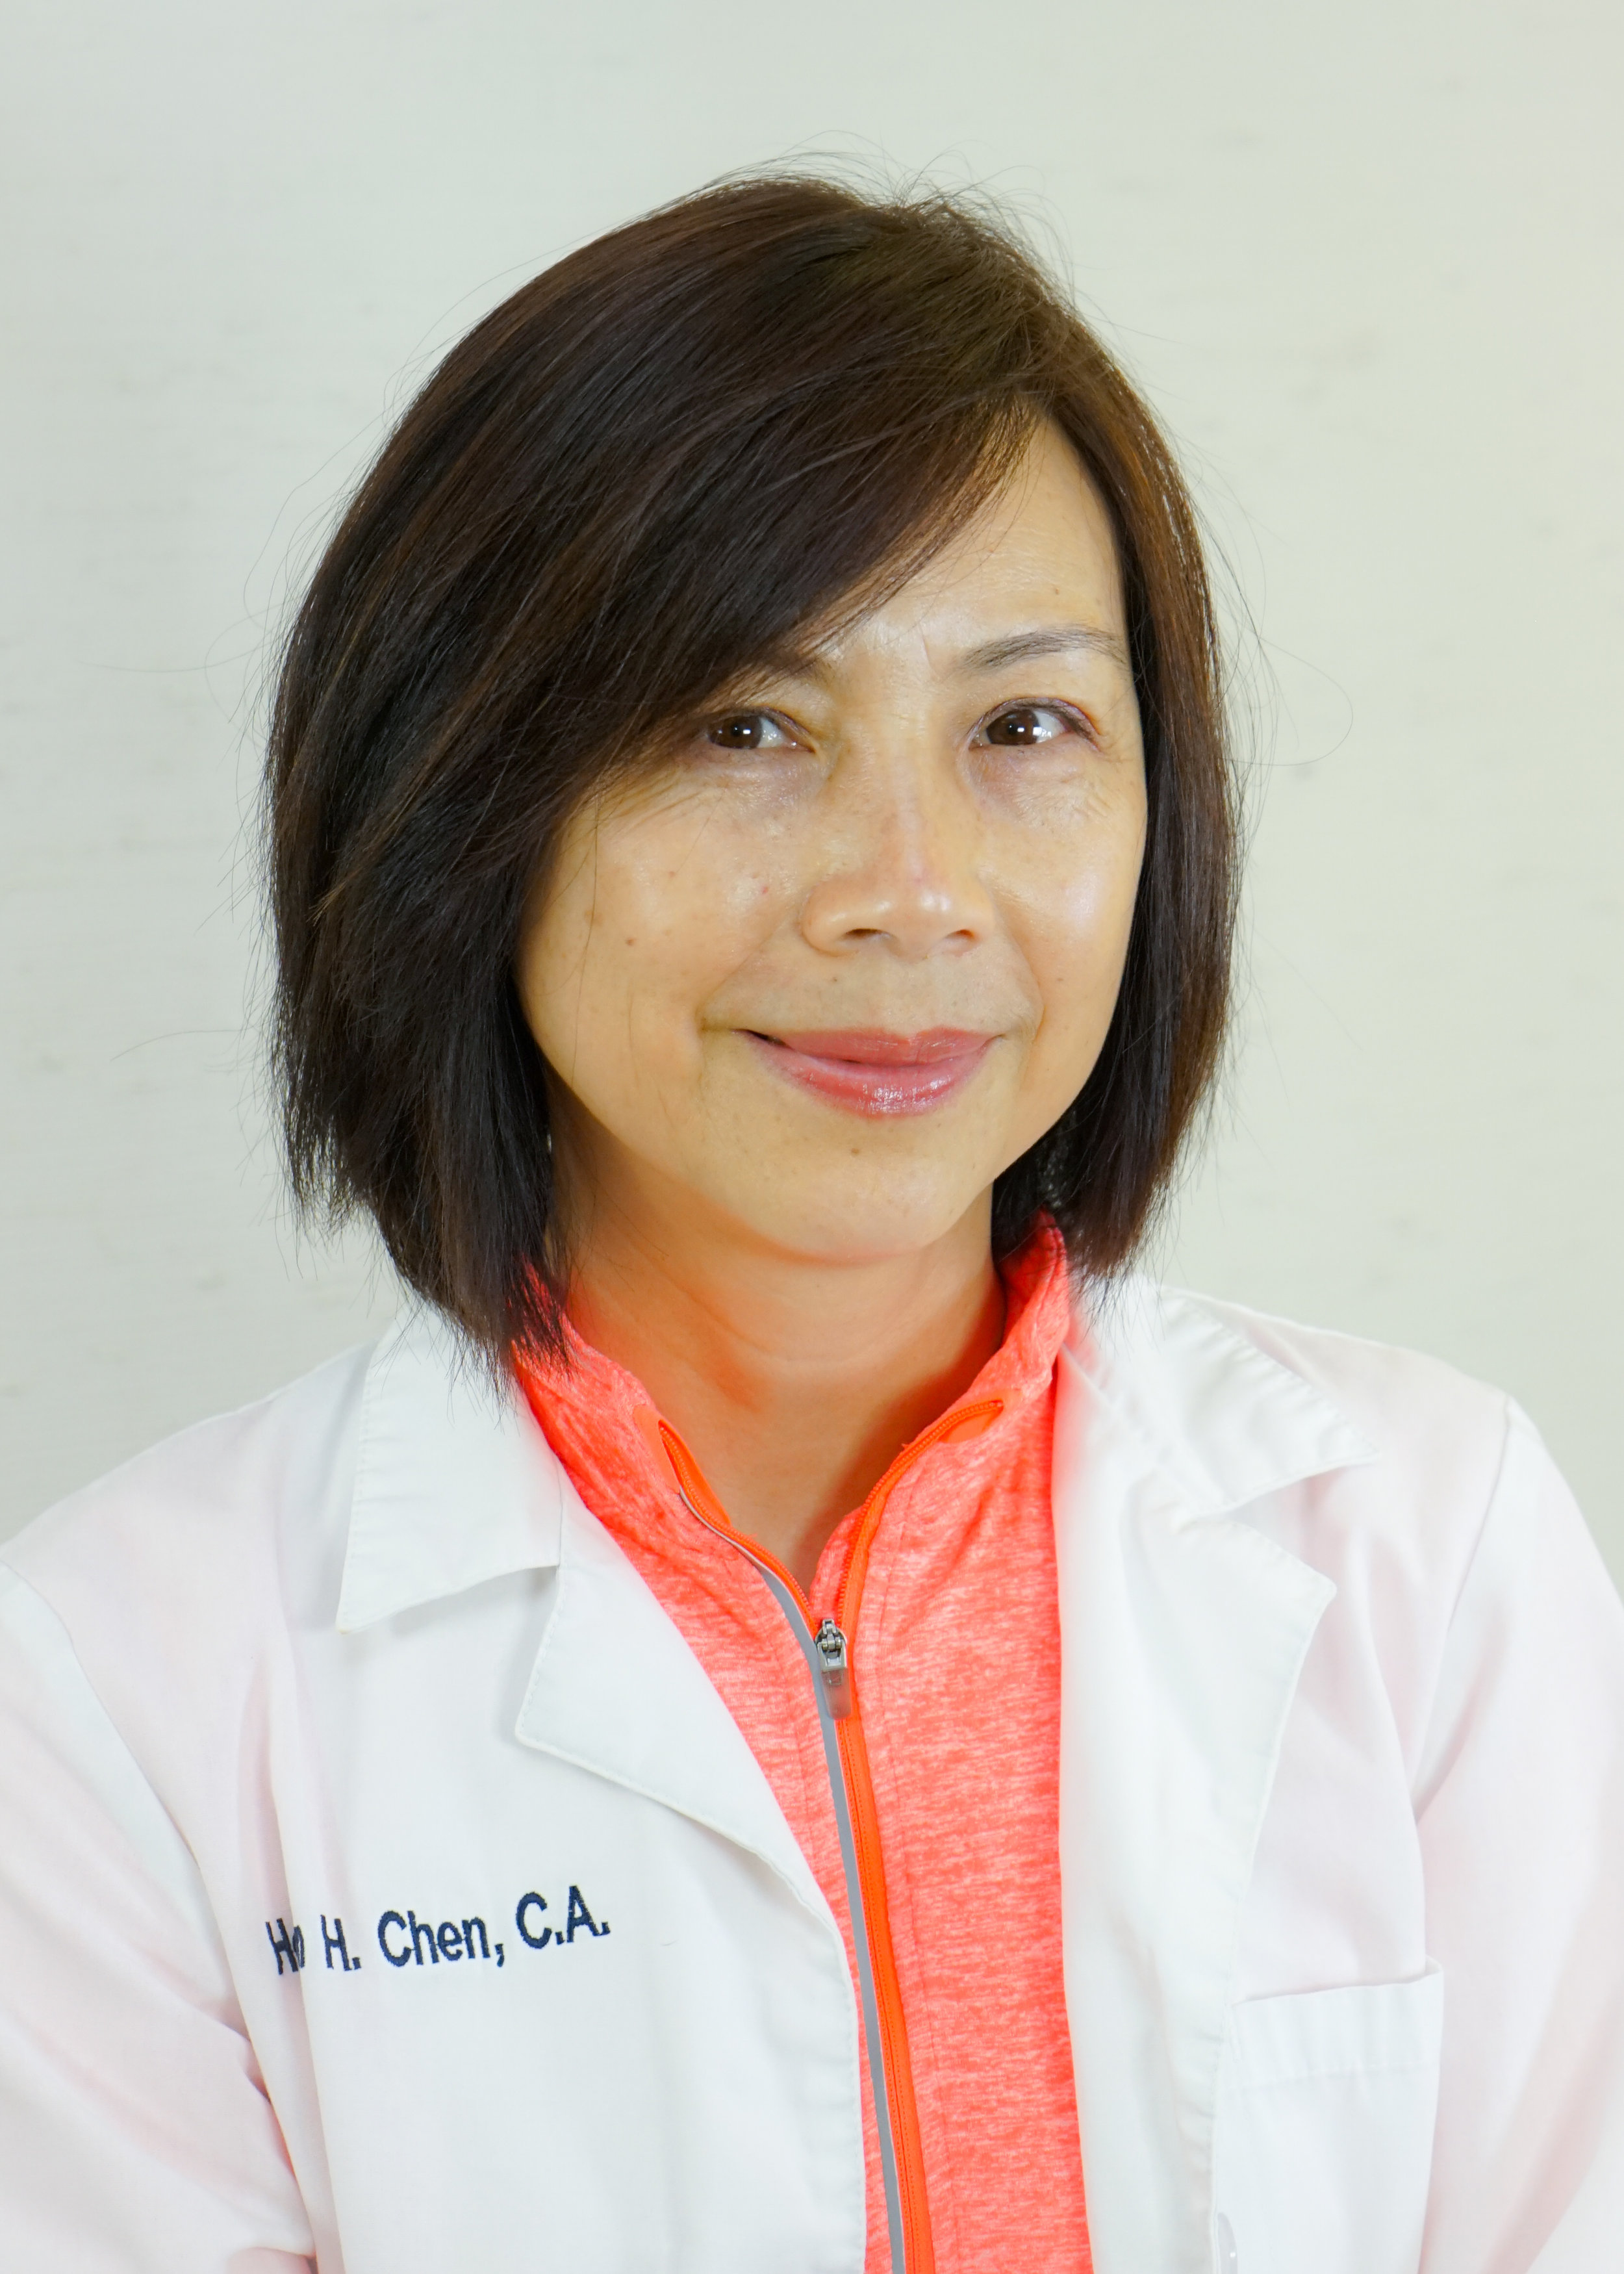 Dr. Helen Chen - Practitioner